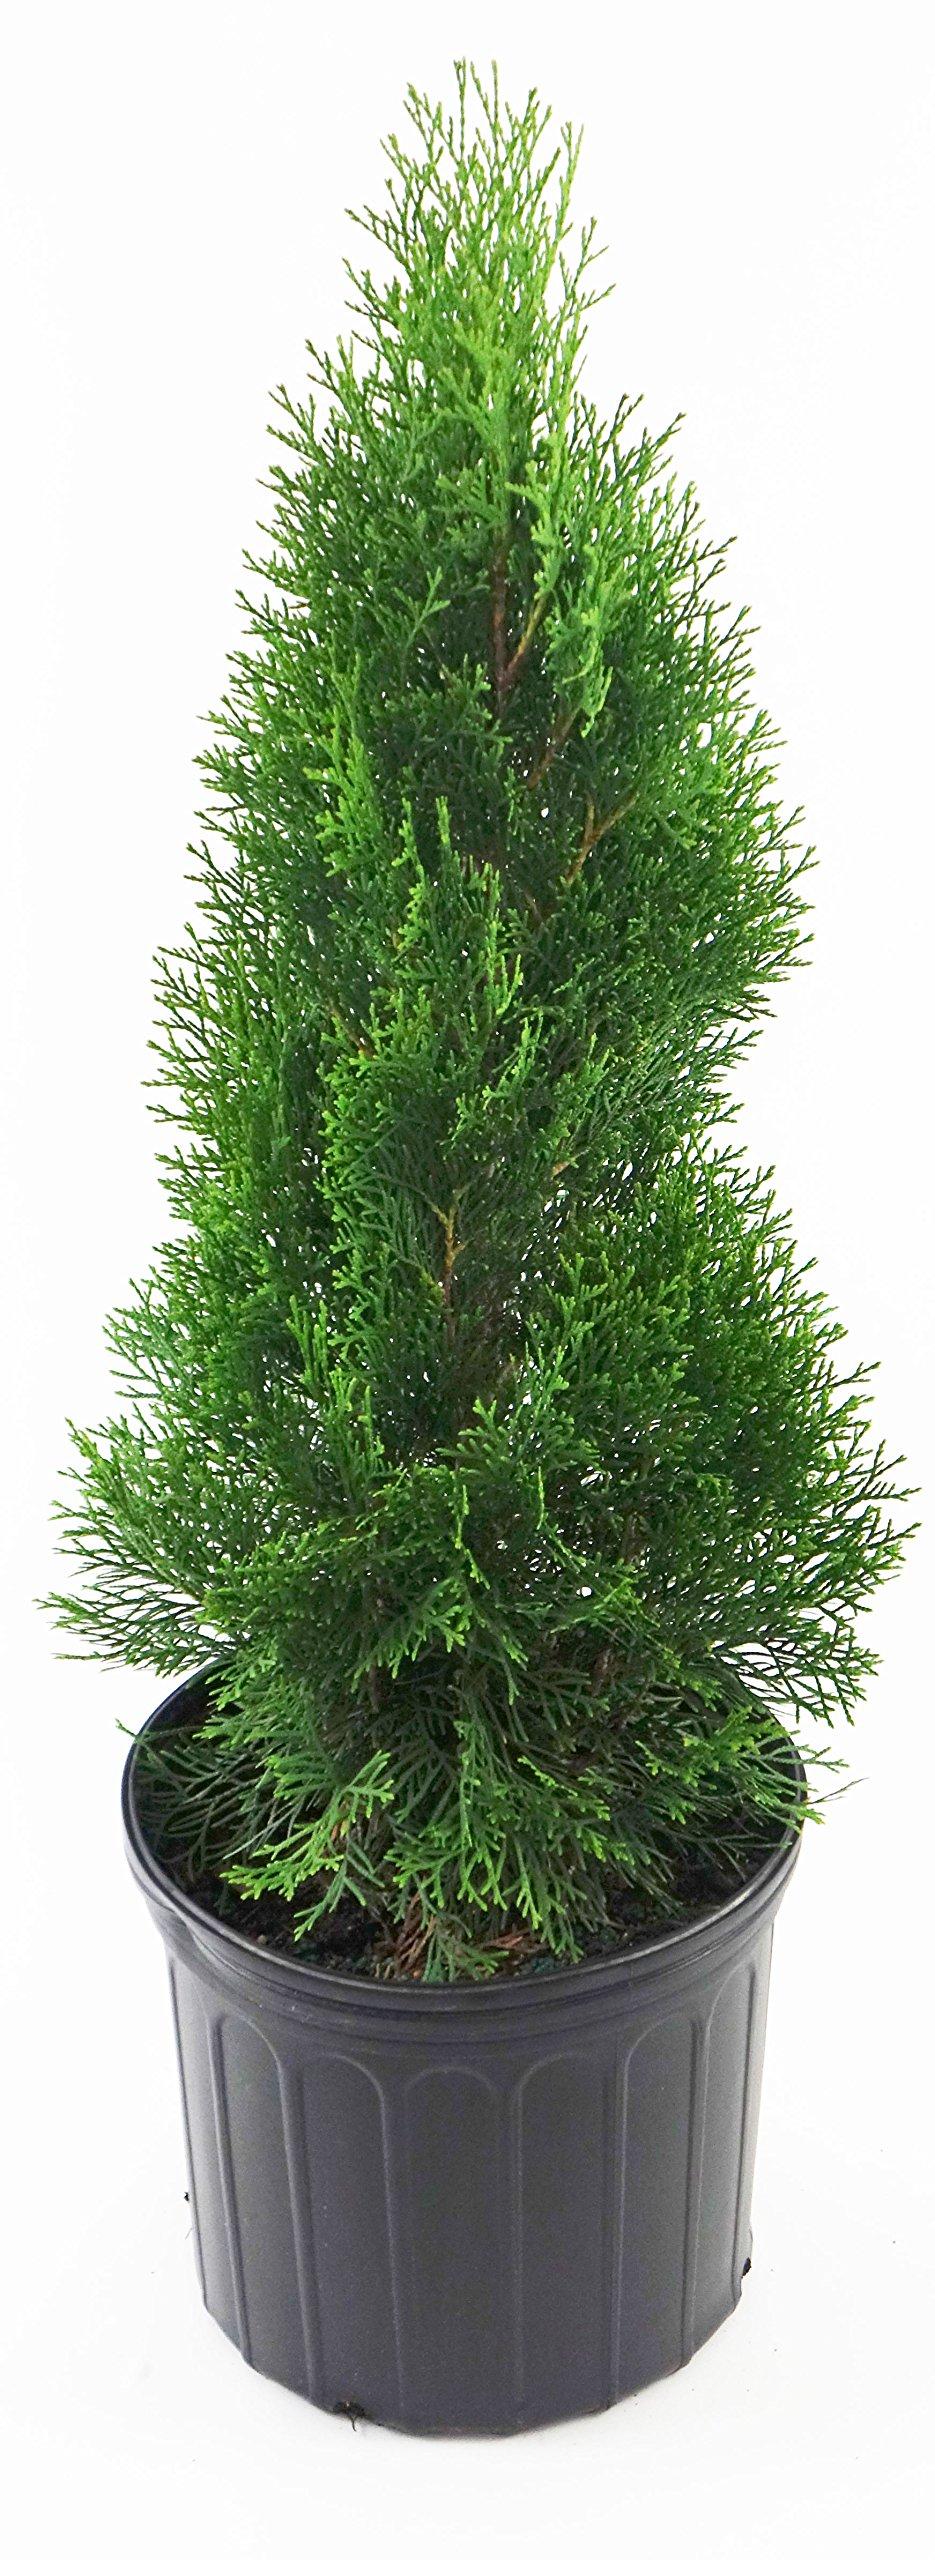 Thuja occidentalis 'Smargd' (Emerald Green Arborvitae) Evergreen, #3 - Size Container